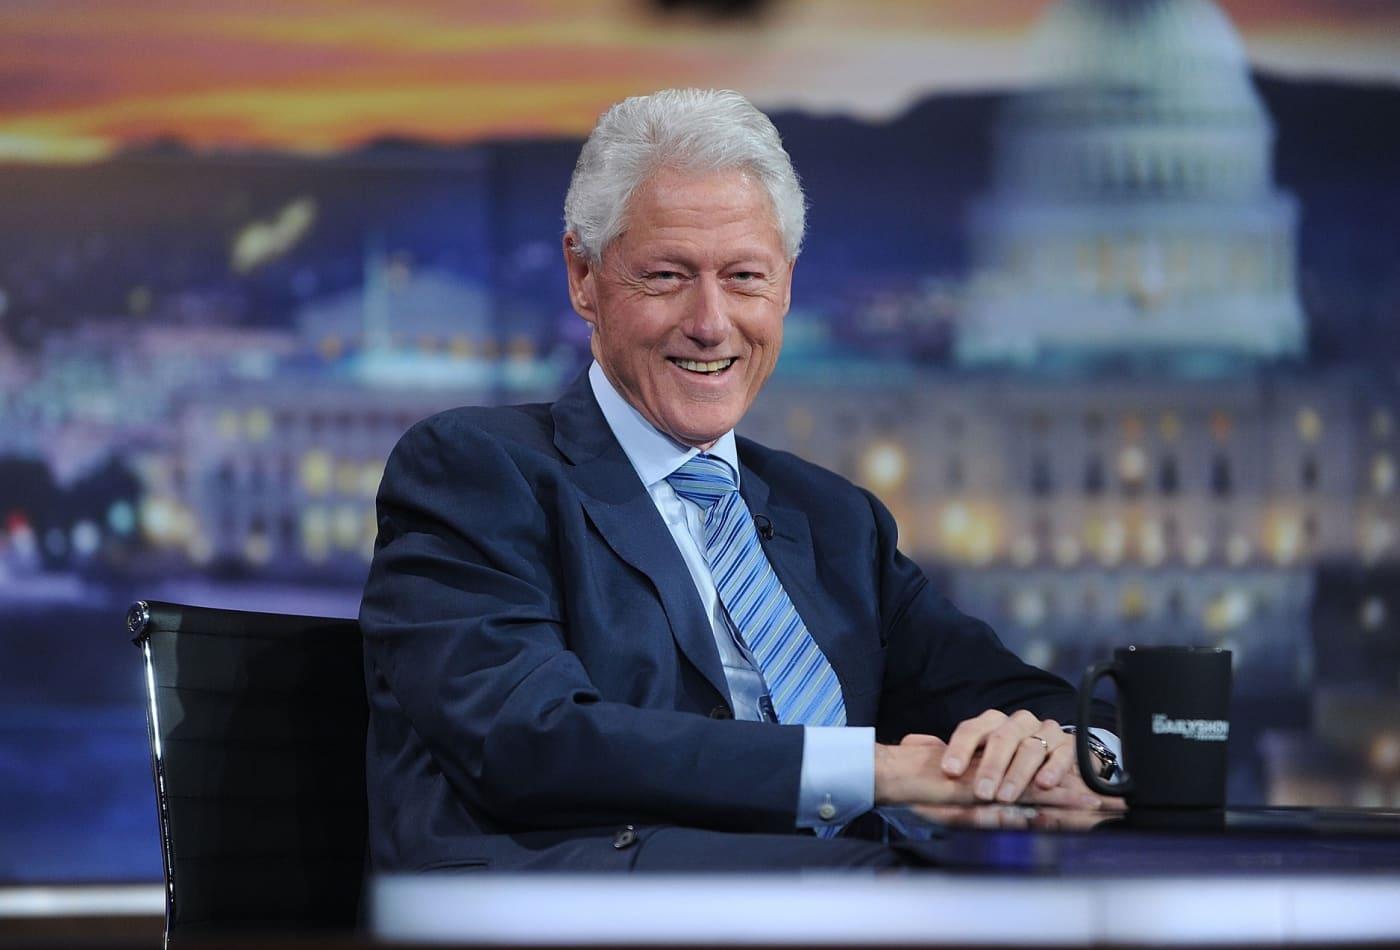 bill clinton - photo #29